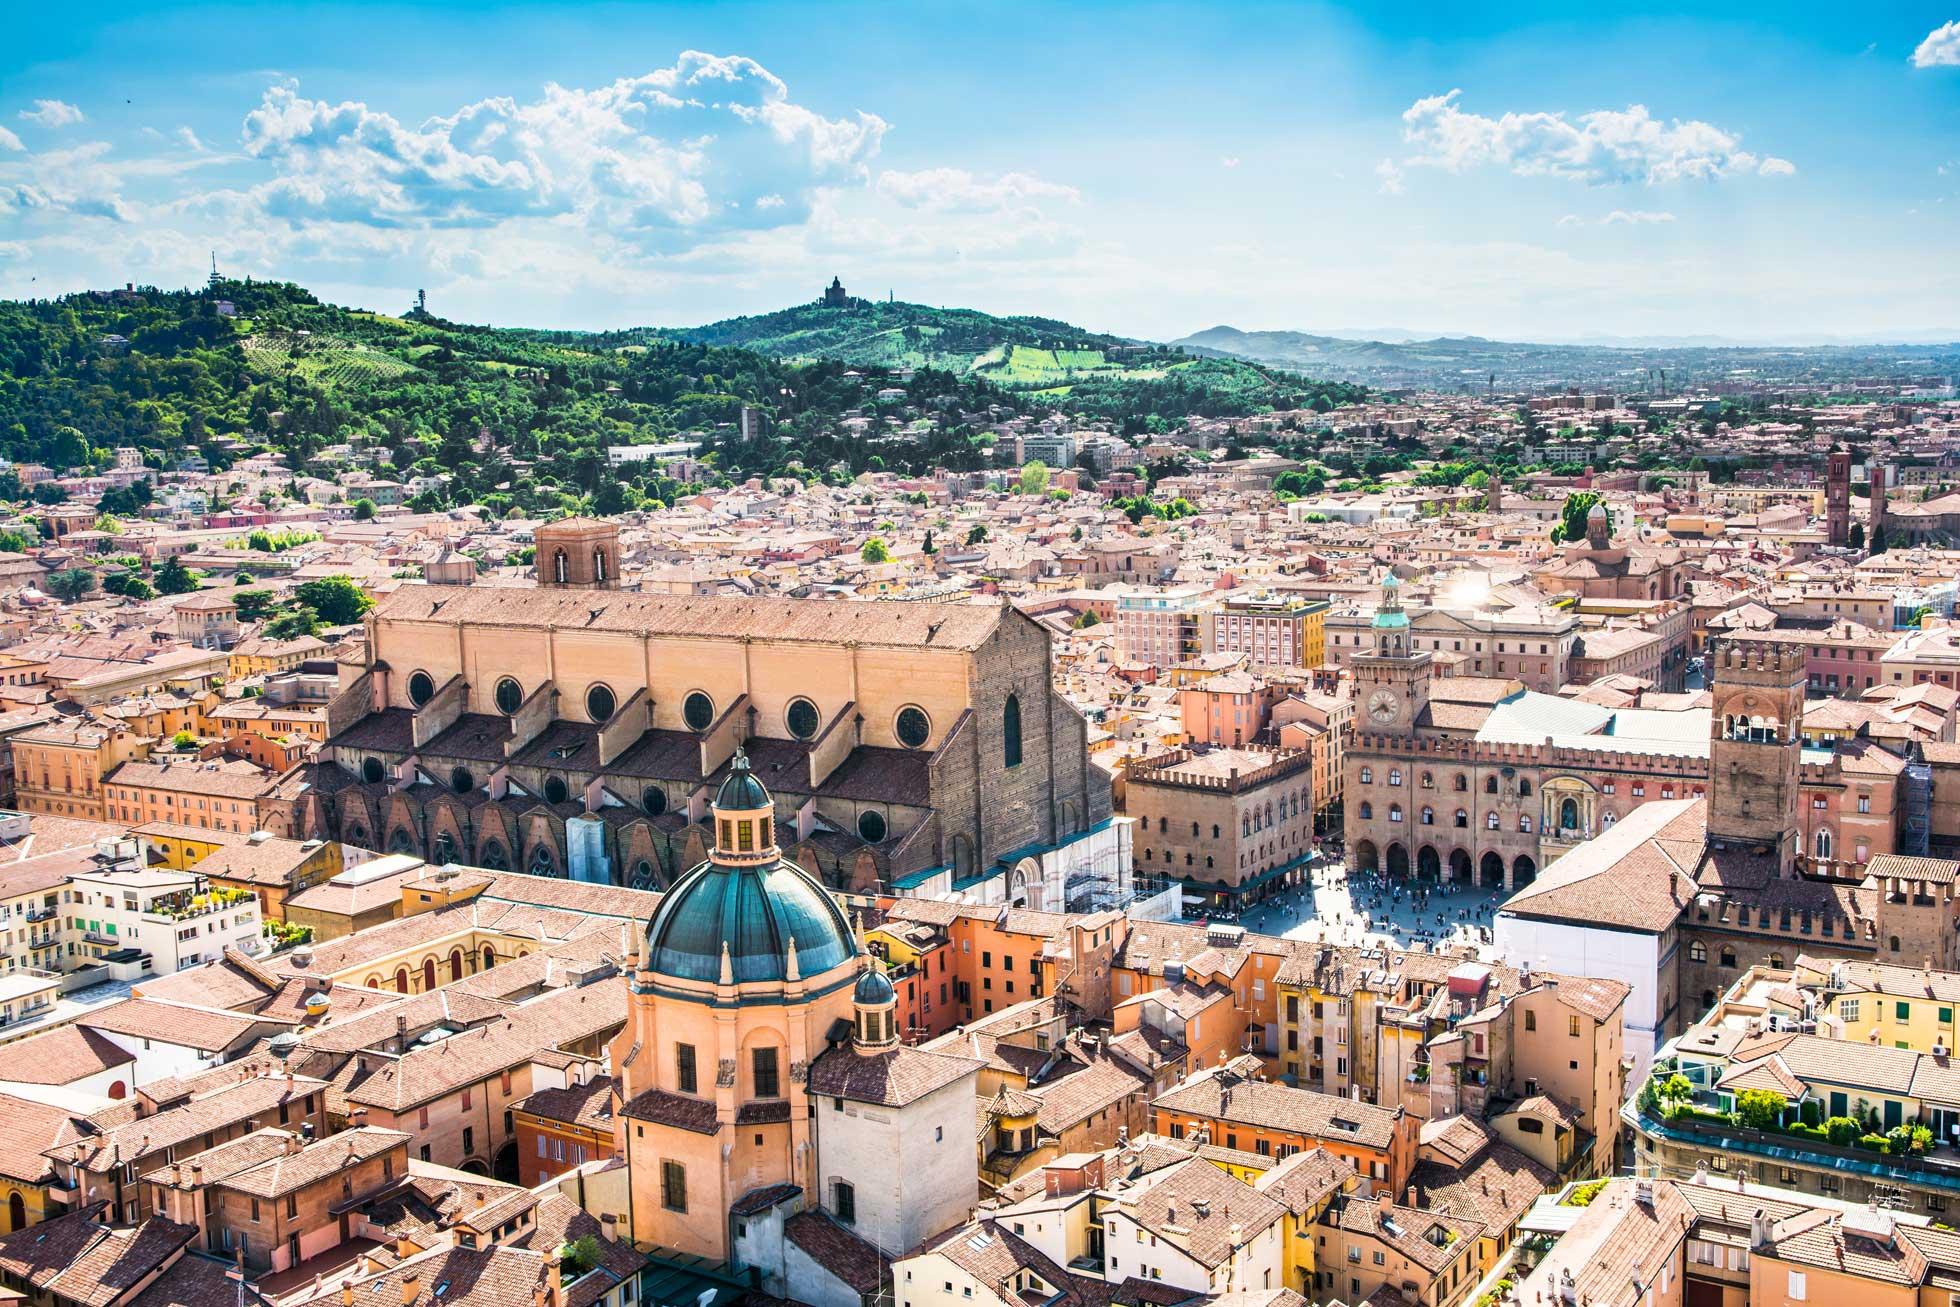 Lokala Bologna med smeknamnet La Grassa